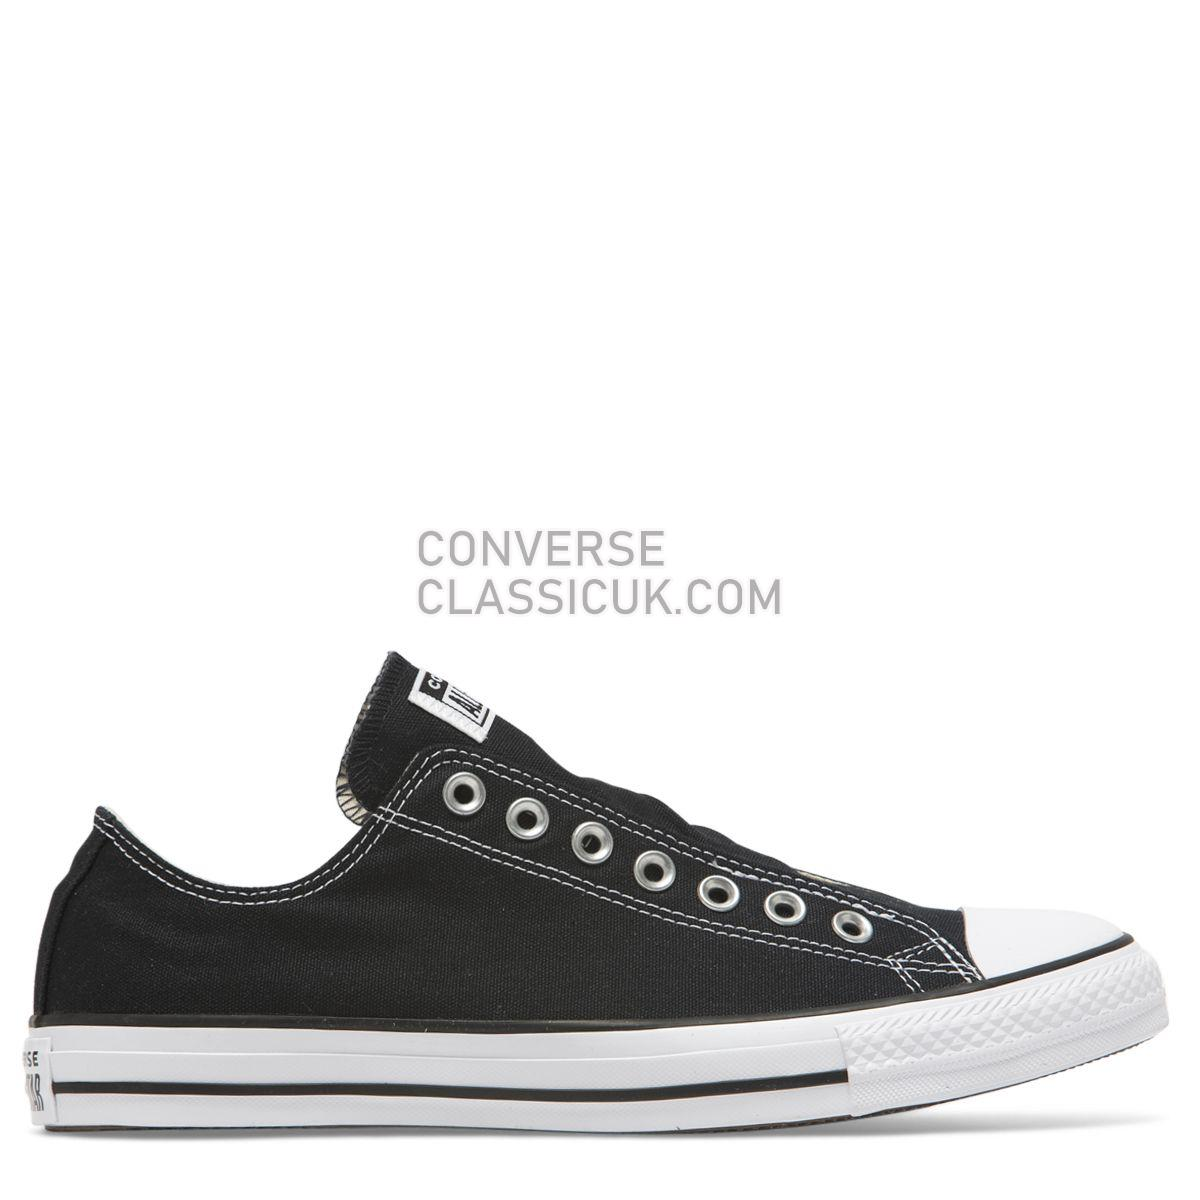 Converse Chuck Taylor All Star Seasonal Slip Low Top Black Mens Womens Unisex 164300 Black/White/Black Shoes